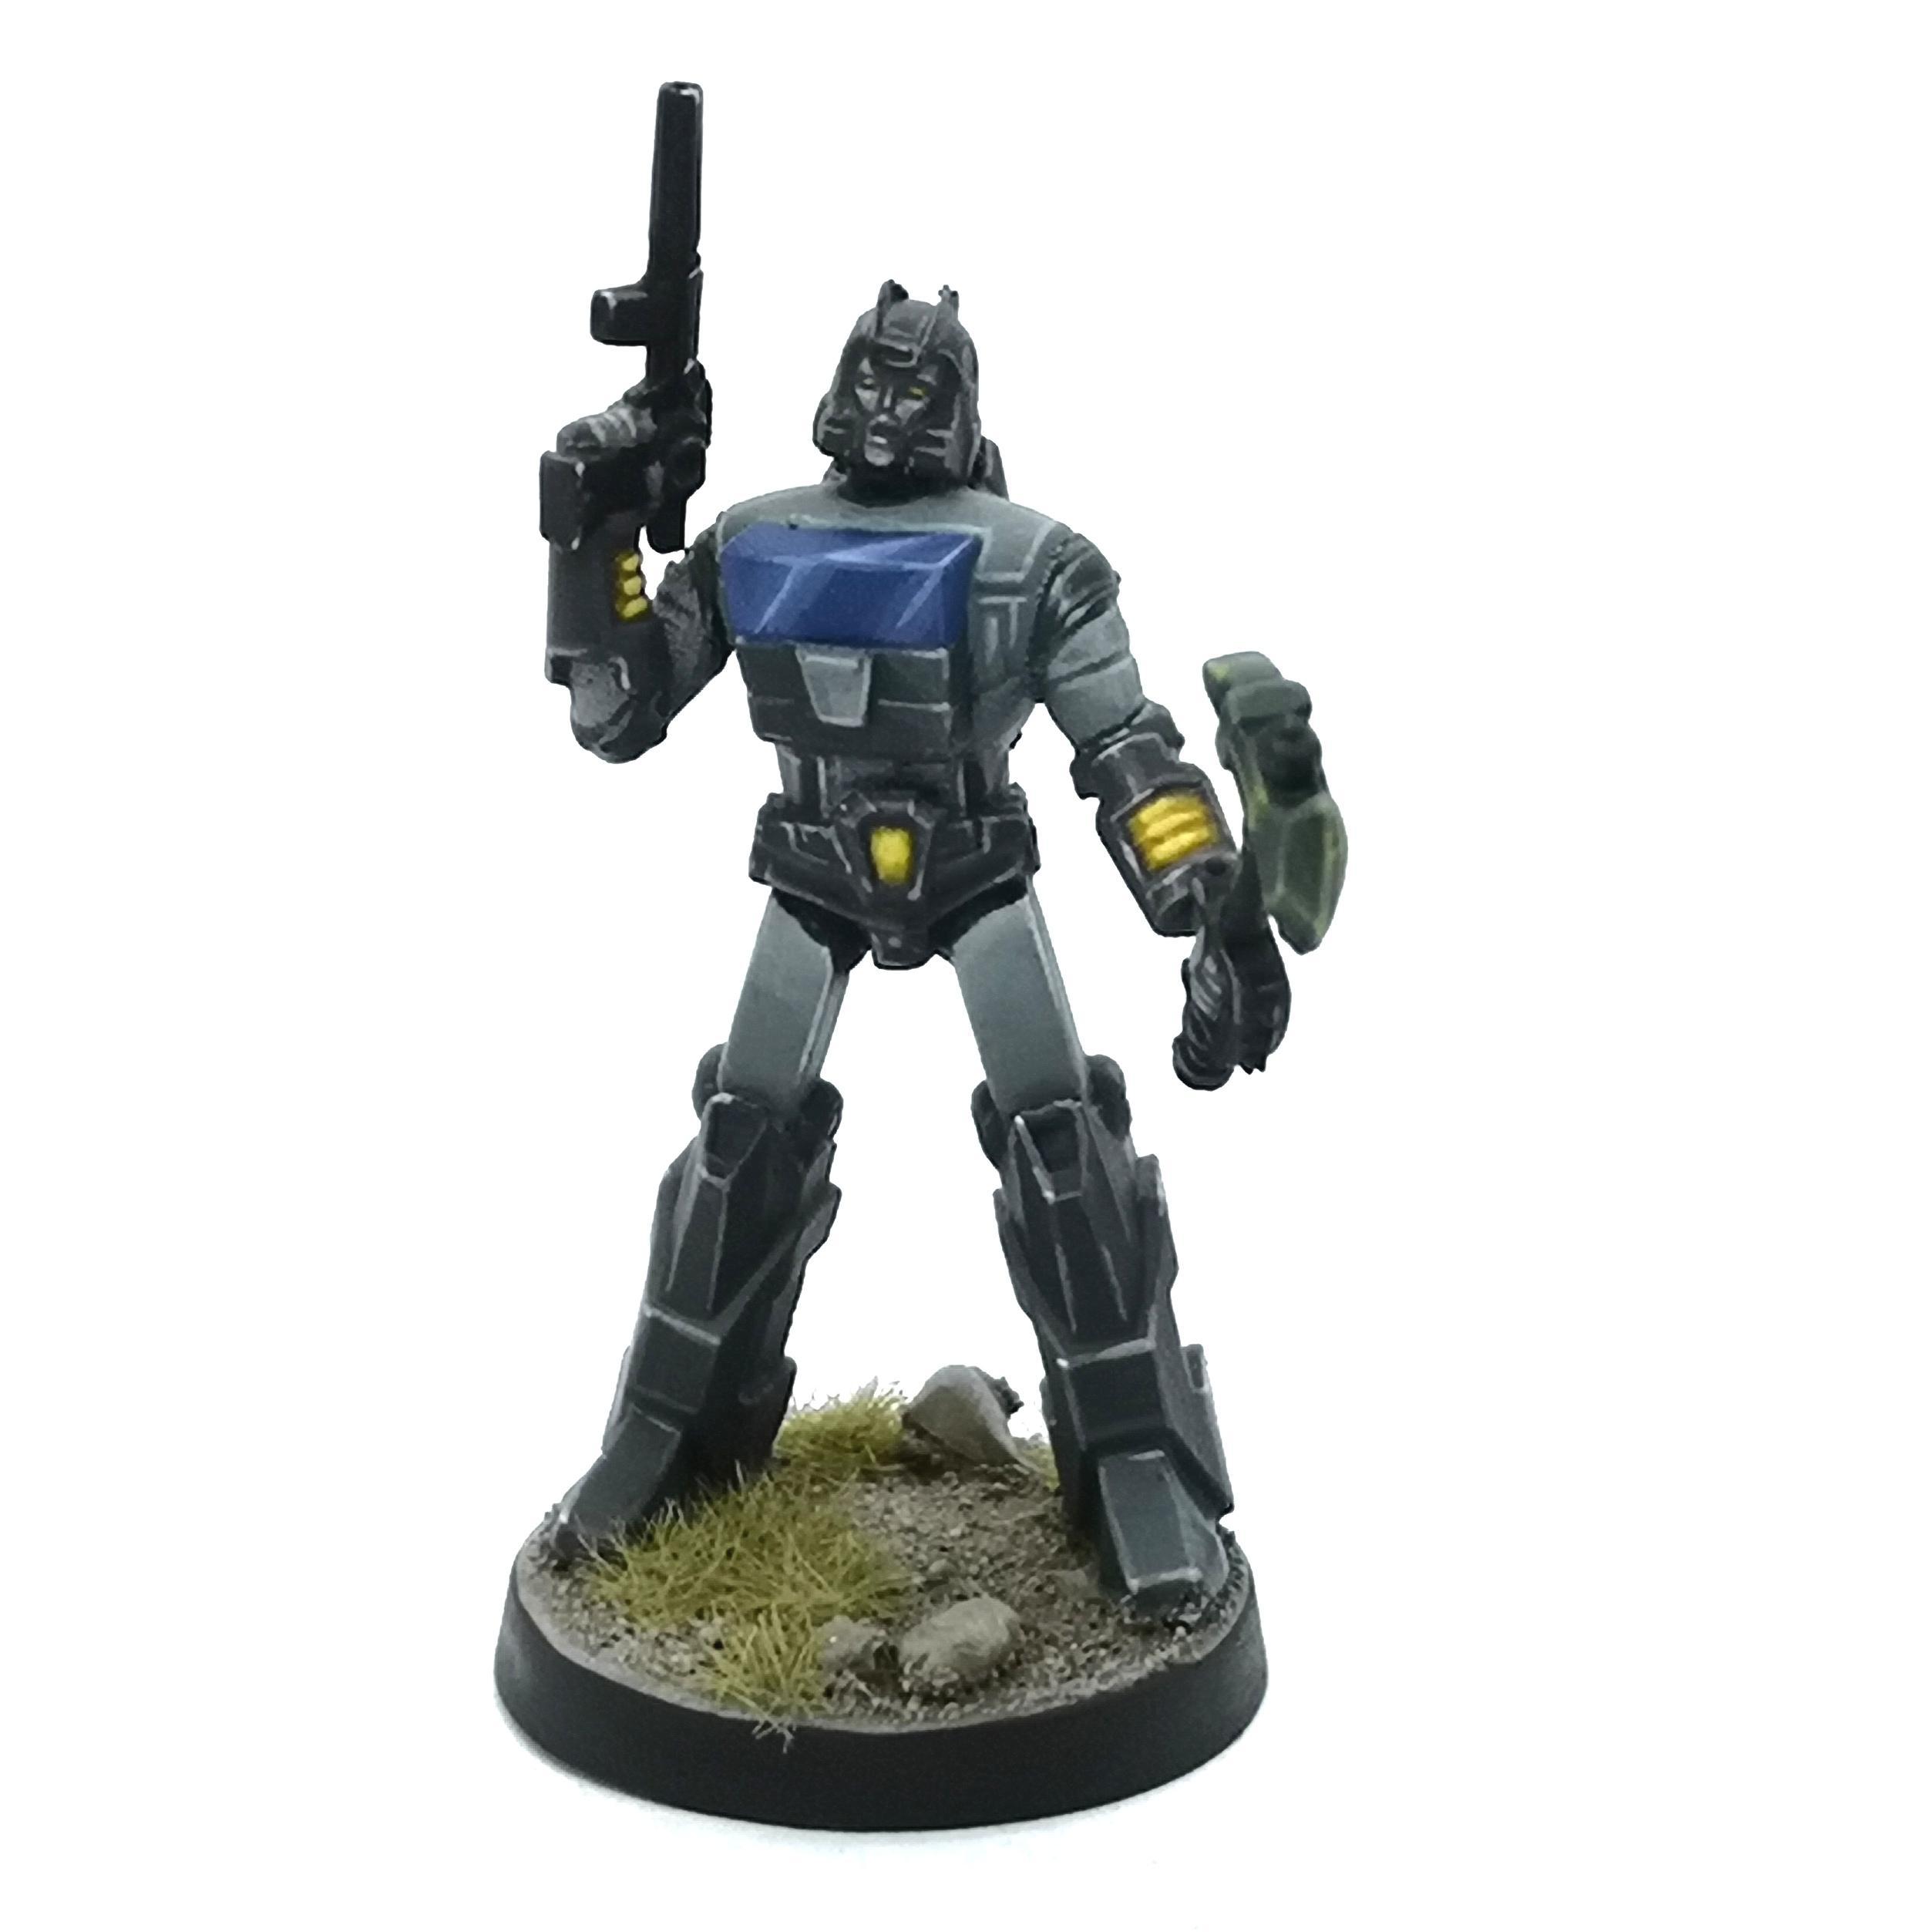 Apax, Bot War, Kup, Mechs, Robots, Traders Galaxy, Transformers